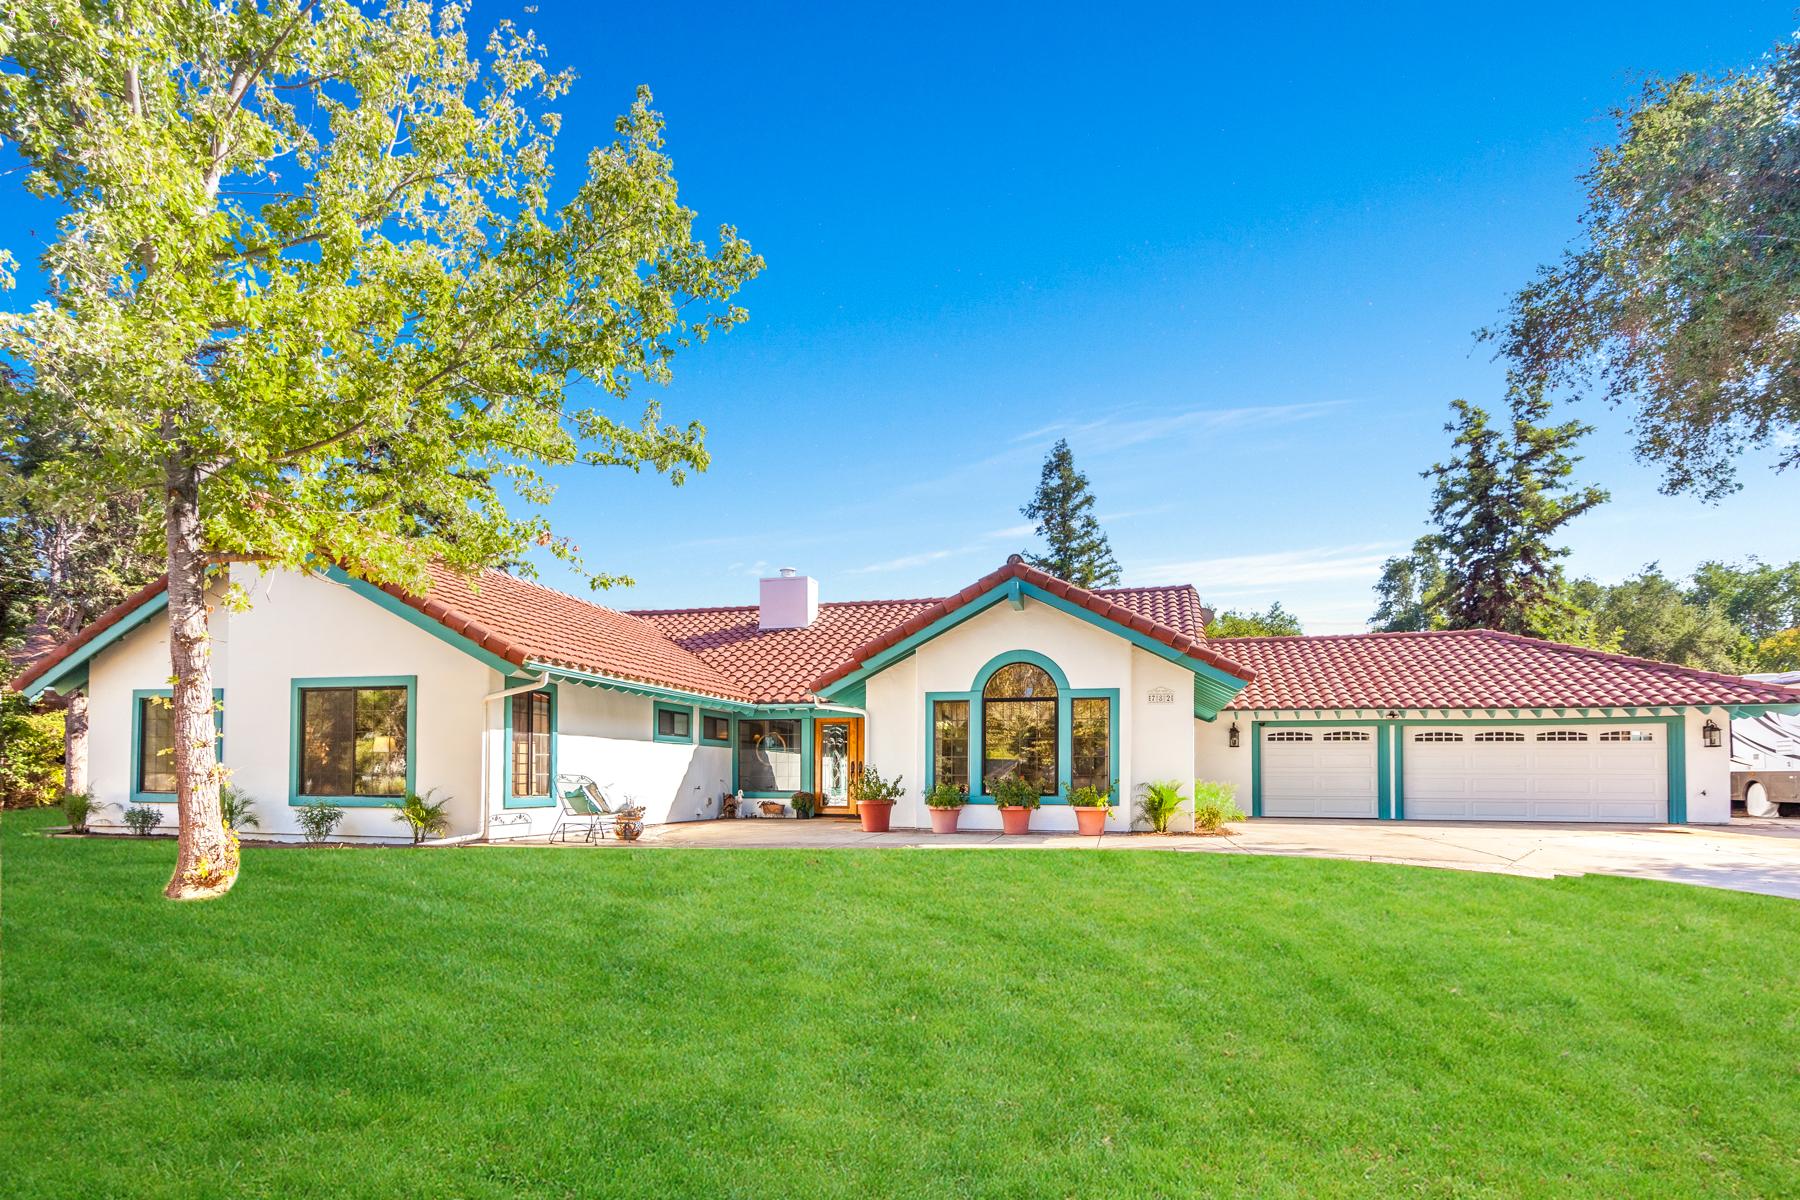 Vivienda unifamiliar por un Venta en 782 Quail St Ojai, California, 93023 Estados Unidos